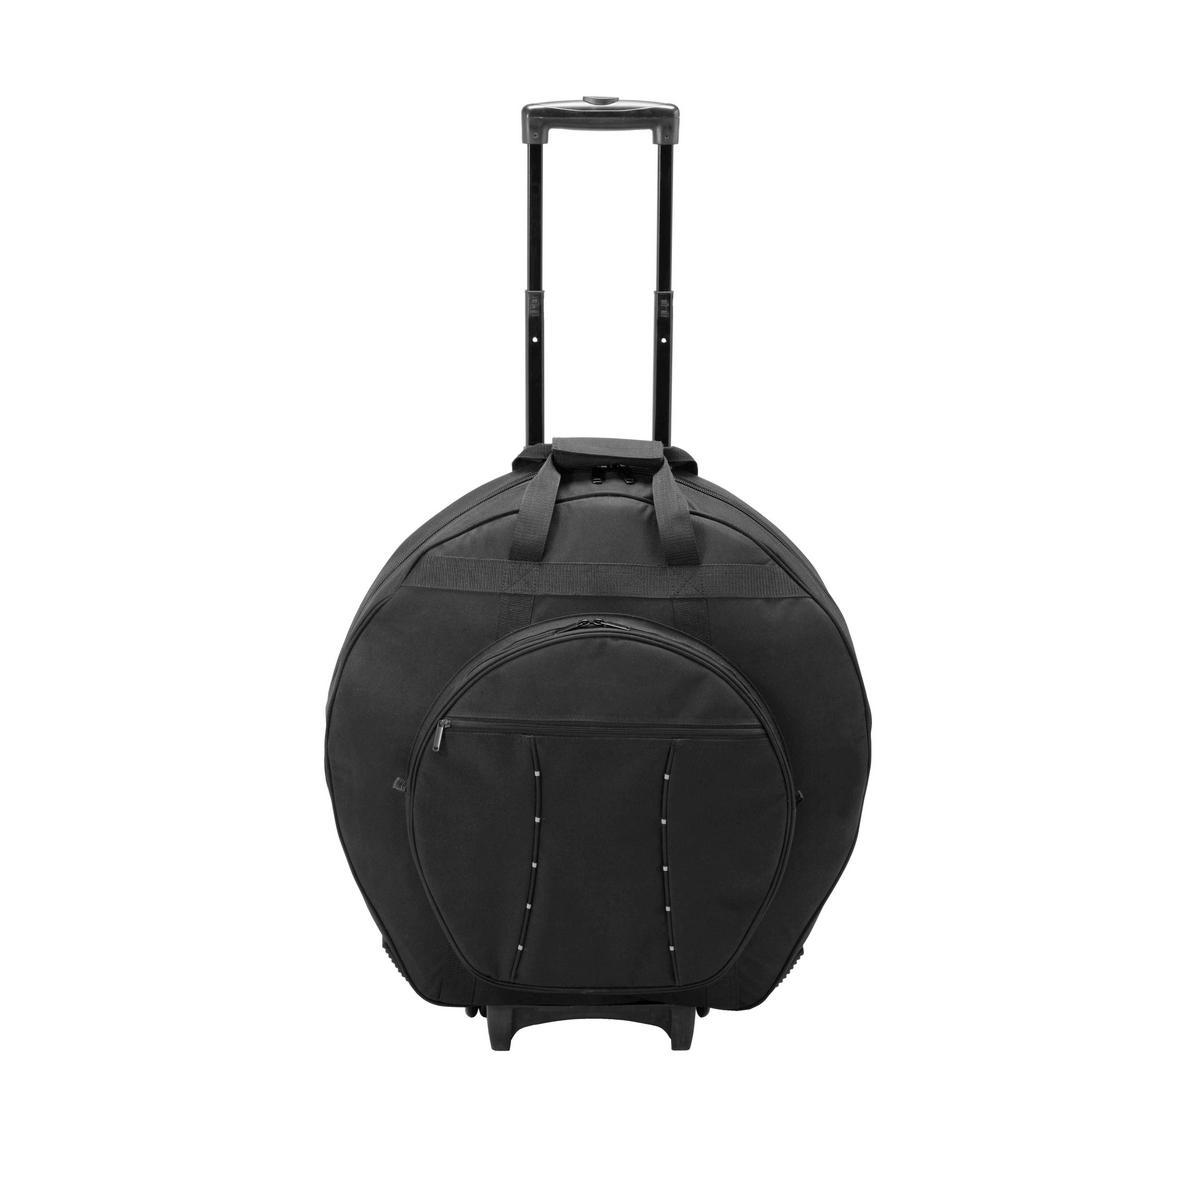 Hardware - Cymbal Bags